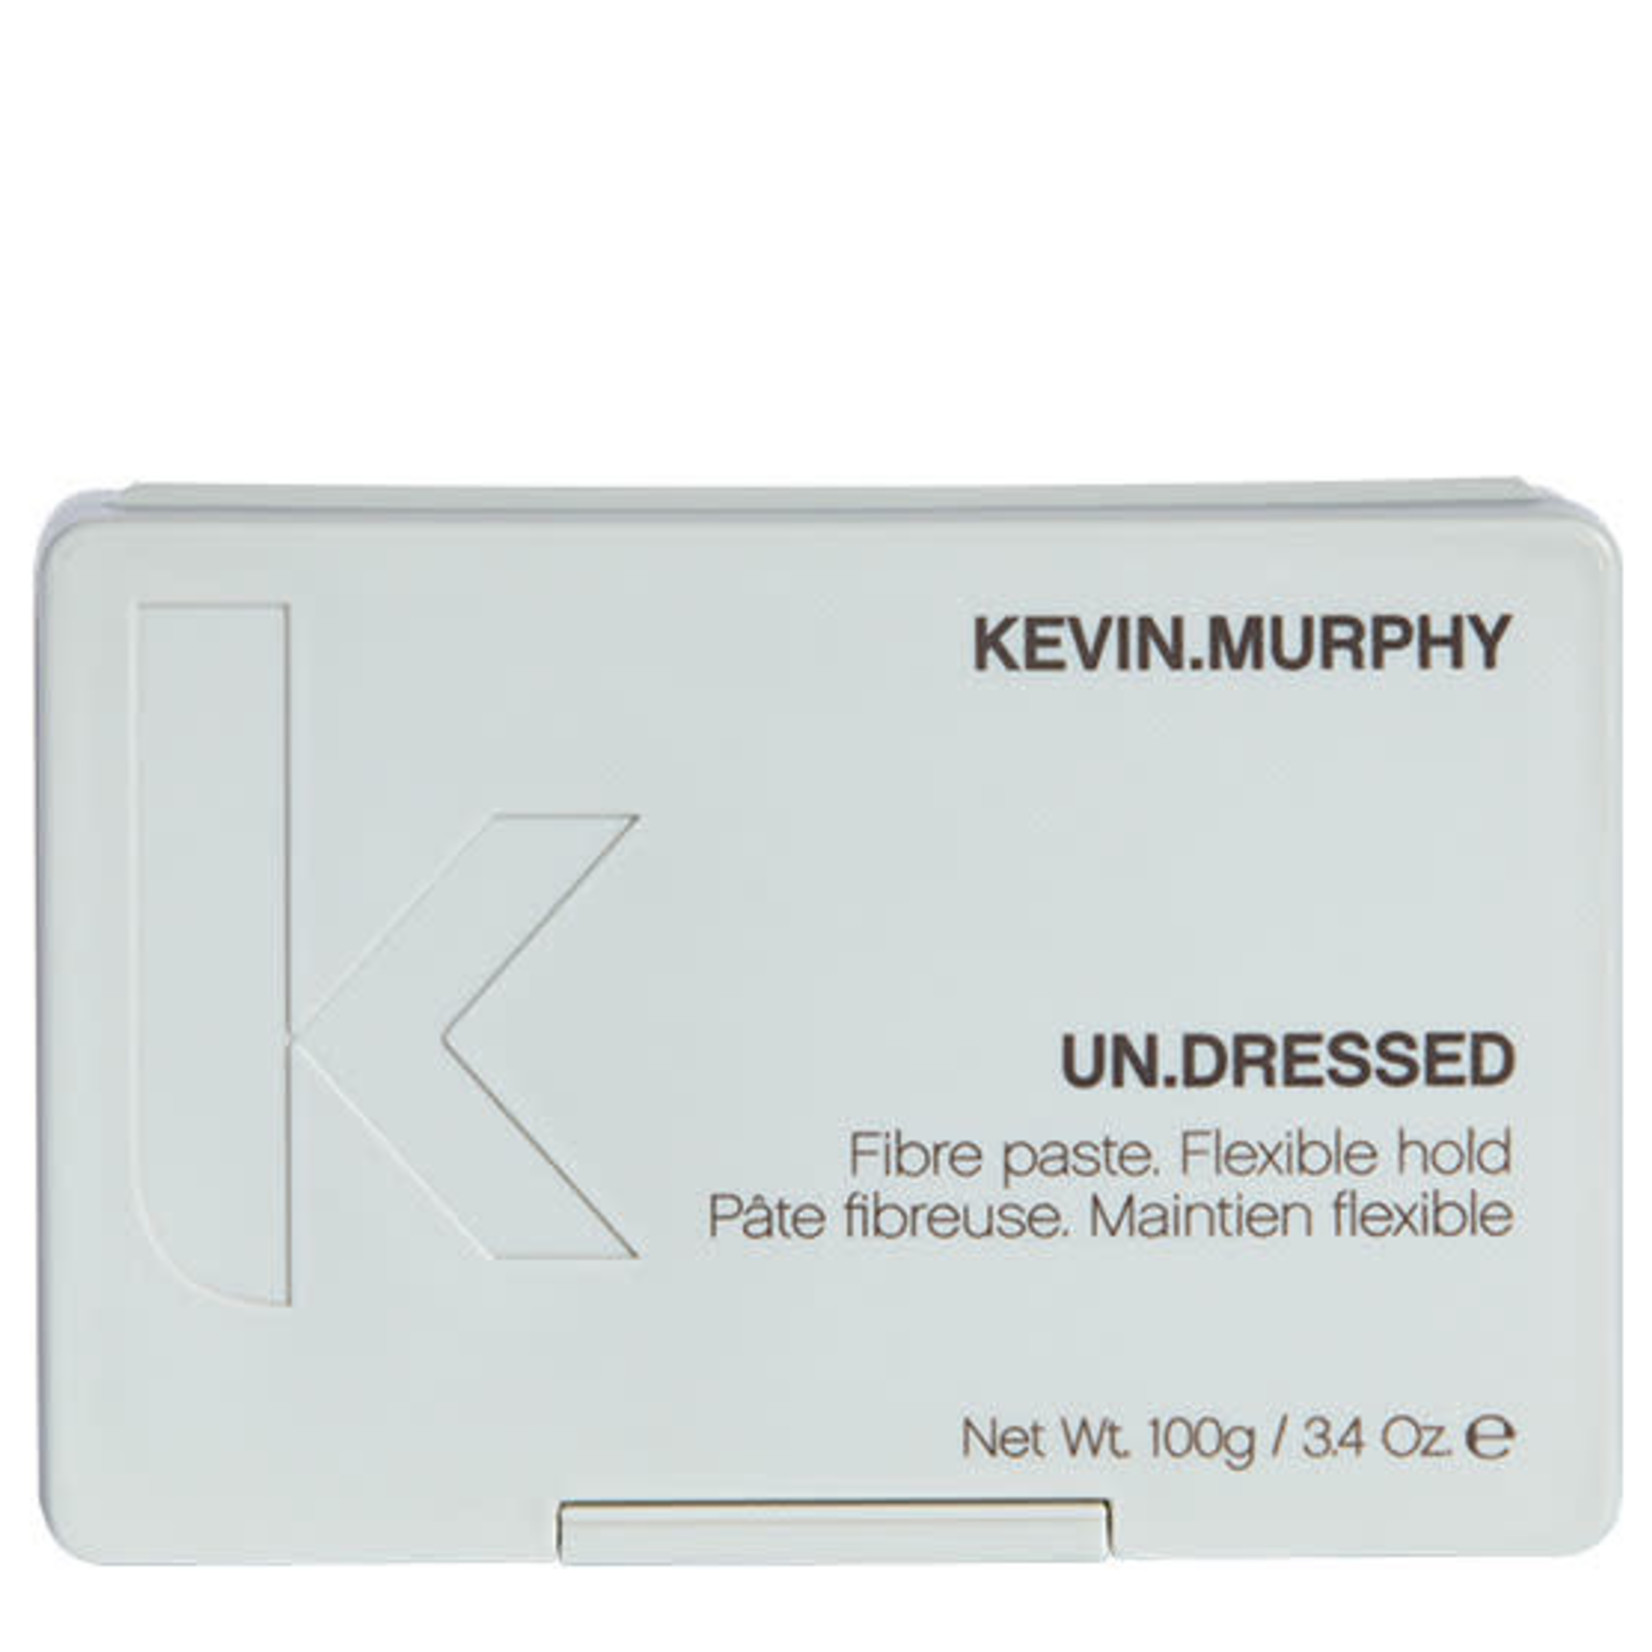 KEVIN.MURPHY UN.DRESSED